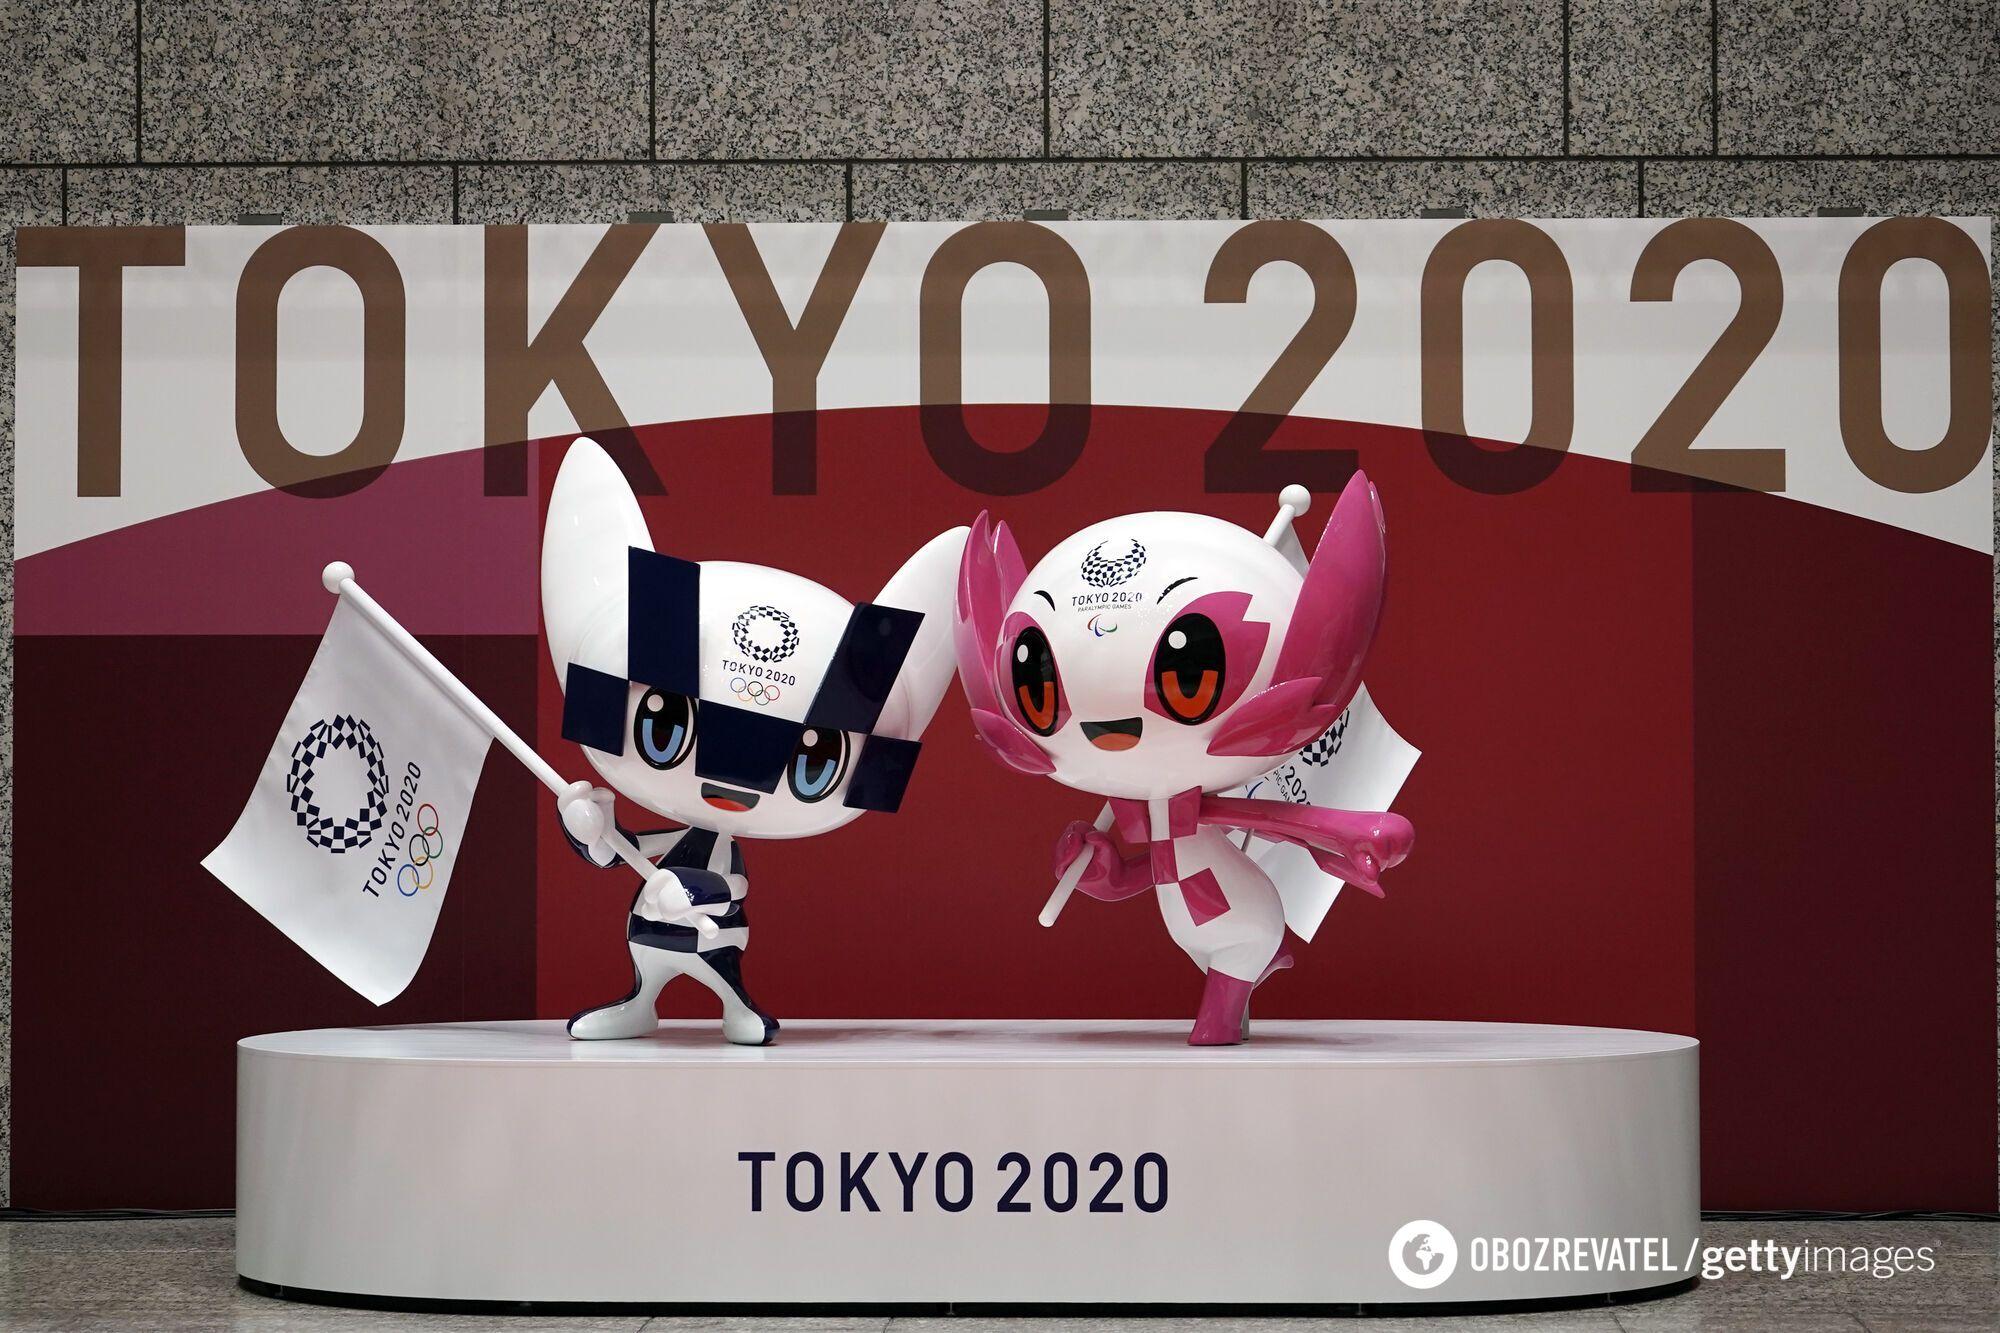 В Токио введен режим чрезвычайной ситуации.